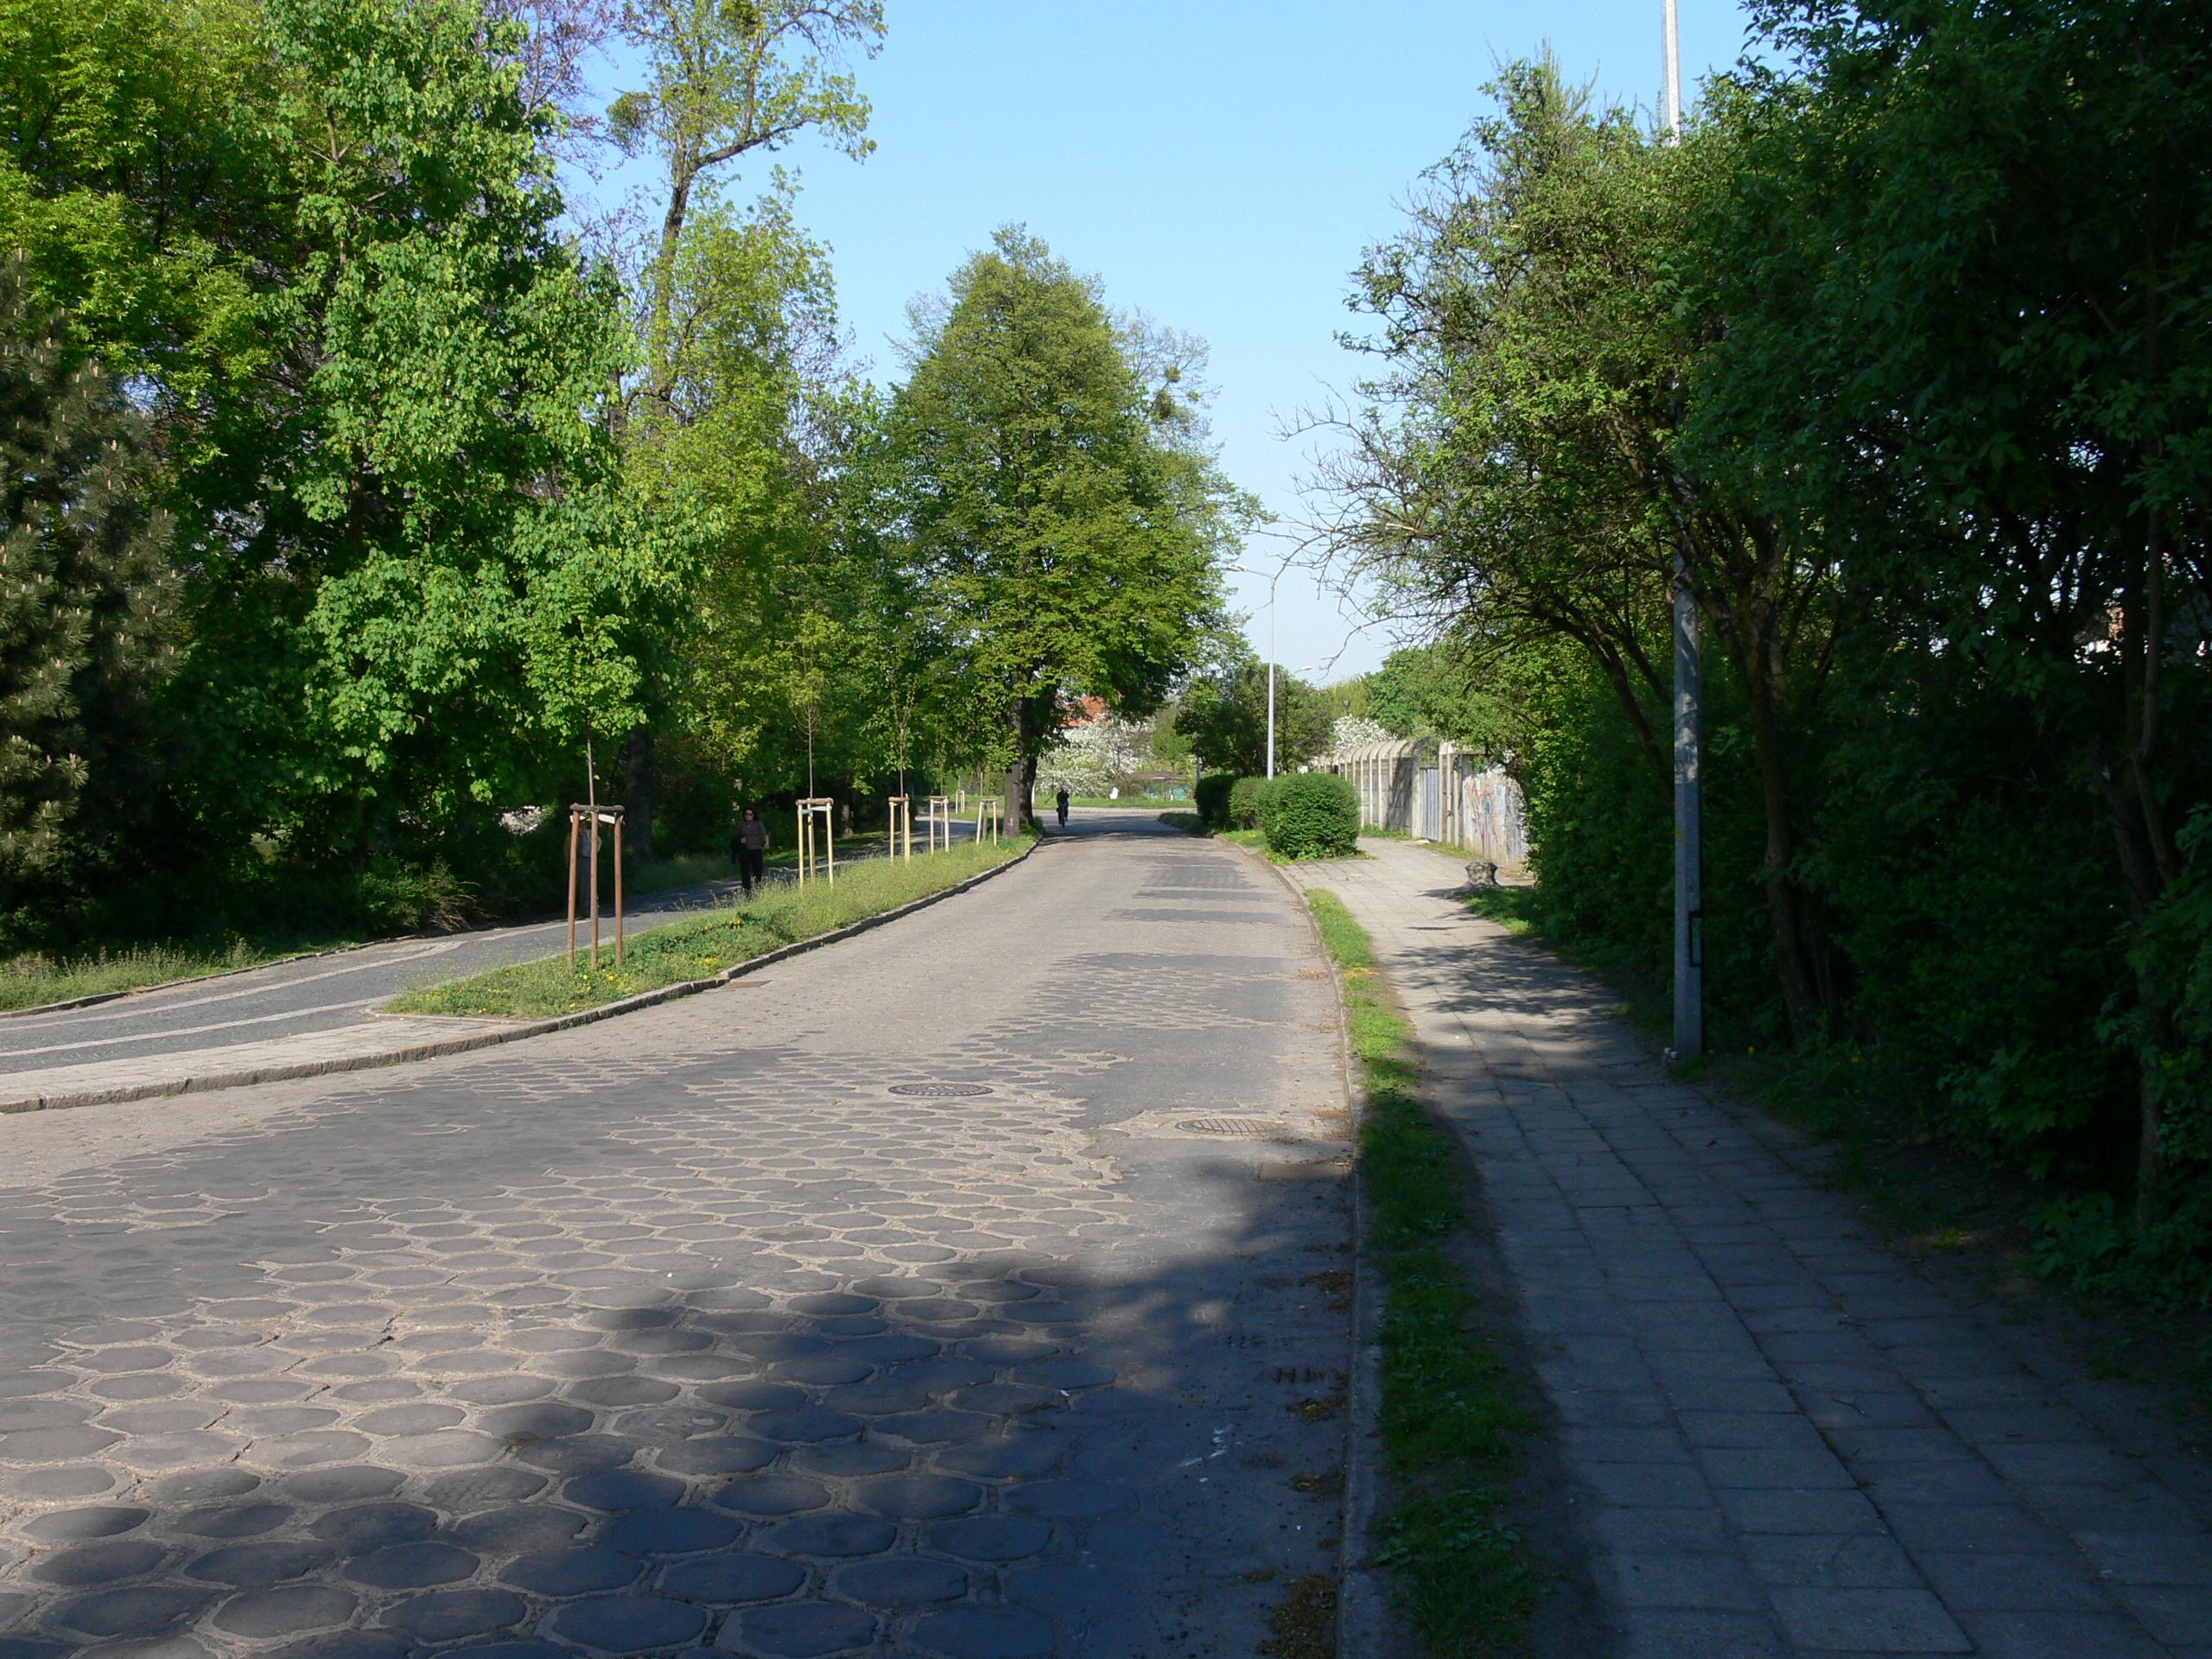 Ulica gen. Józefa Bema w Raciborzu